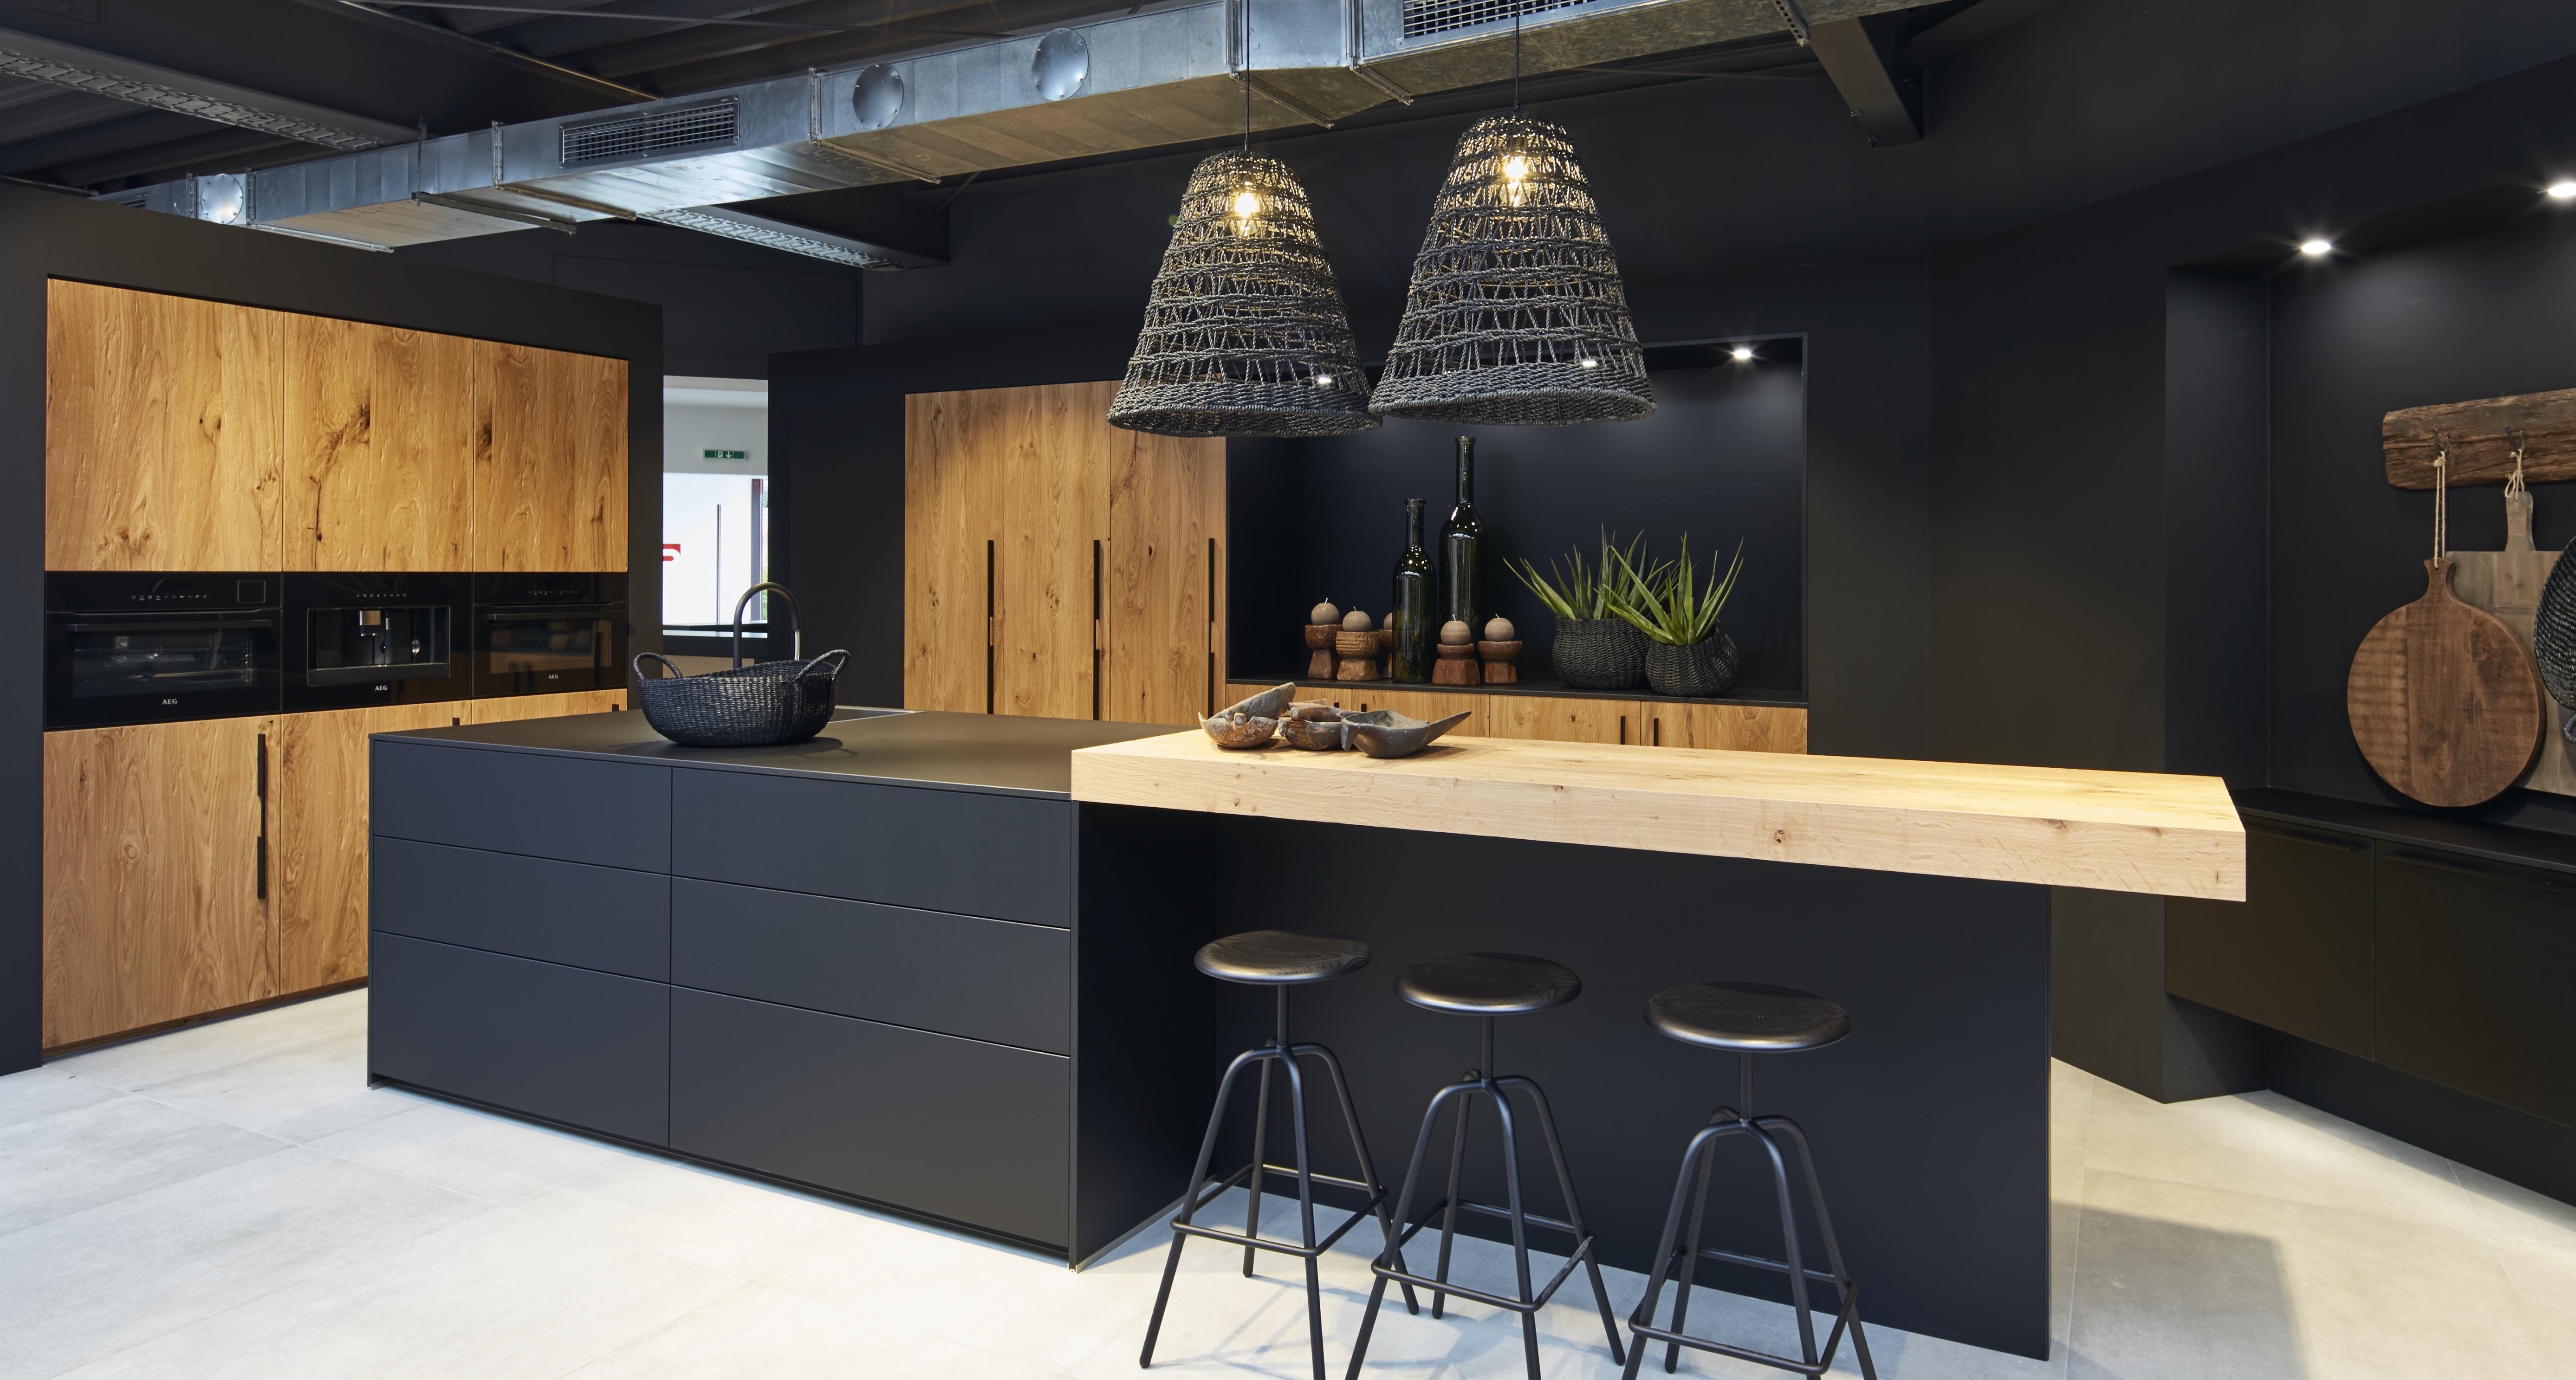 Cocina blanca o negra t cu l eliges dekocina for Cocinas modernas negras con rojo